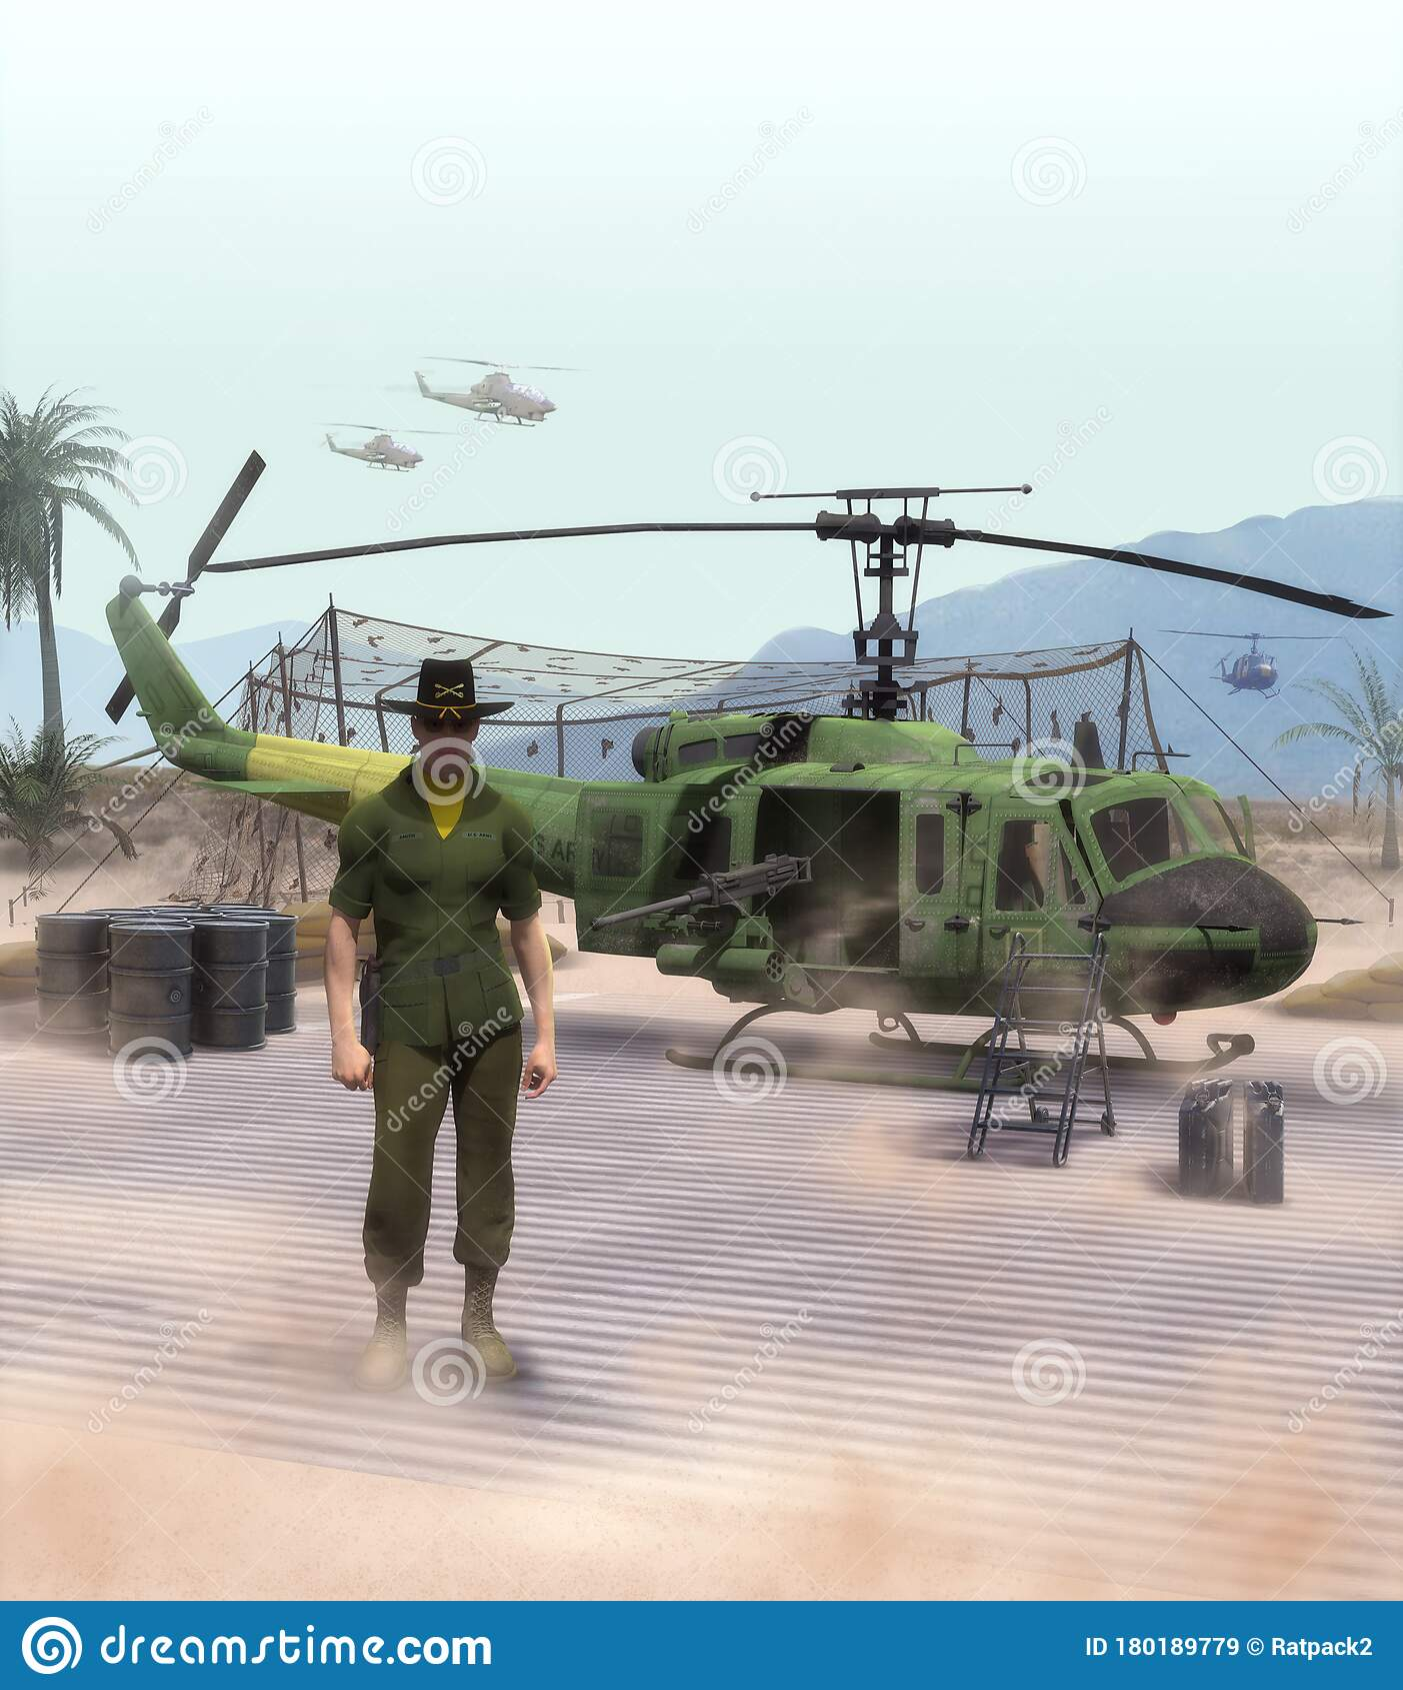 Helicopter Vietnam Stock Illustrations 47 Helicopter Vietnam Stock Illustrations Vectors Clipart Dreamstime